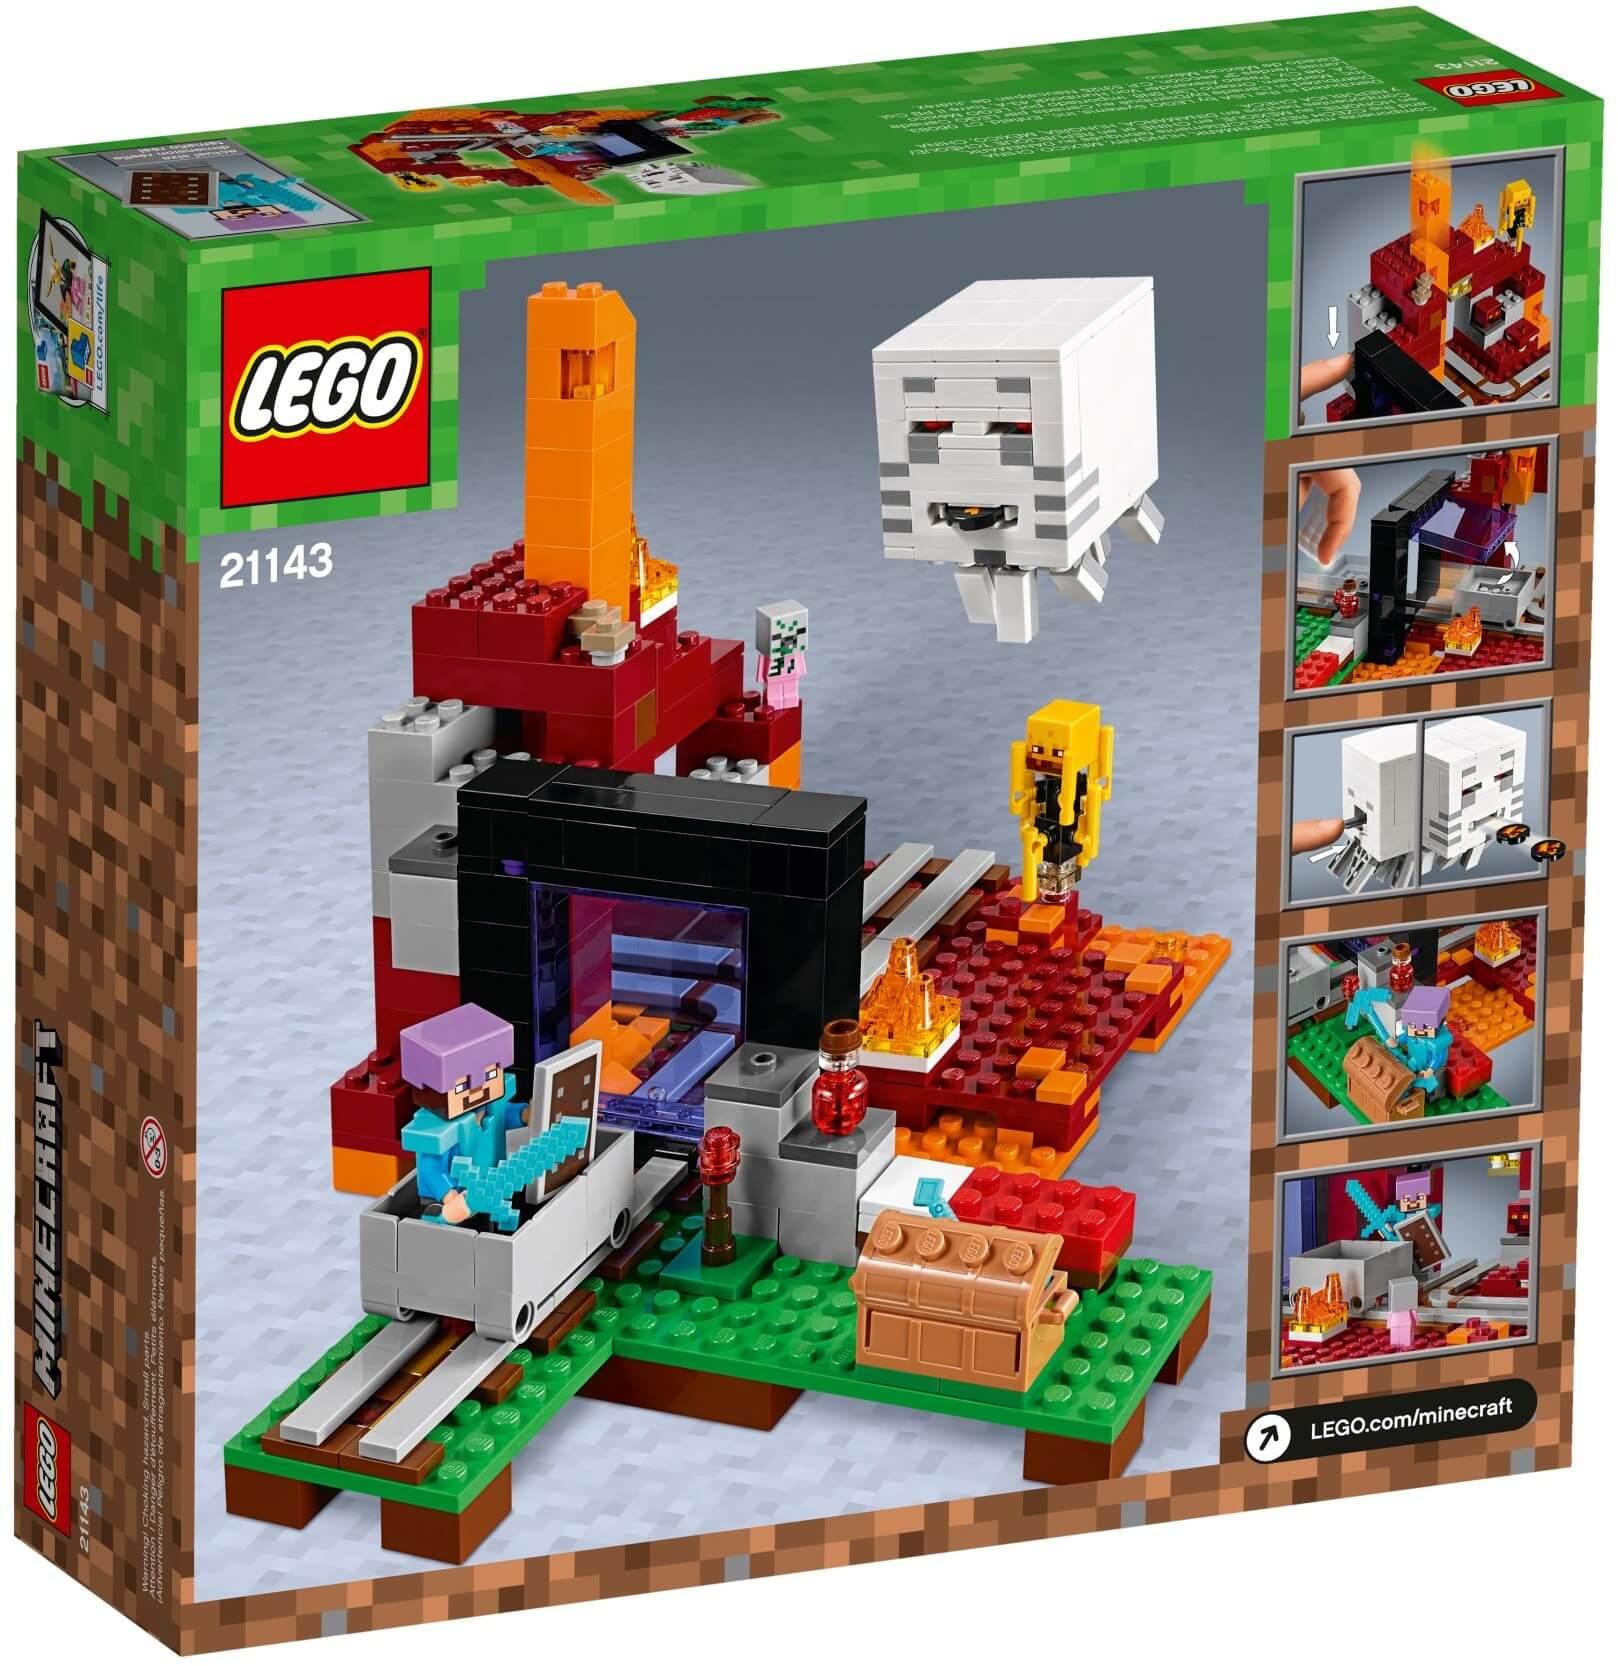 Mua đồ chơi LEGO 21143 - LEGO Minecraft 21143 - Cánh Cổng Địa Ngục (LEGO Minecraft 21143 The Nether Portal)